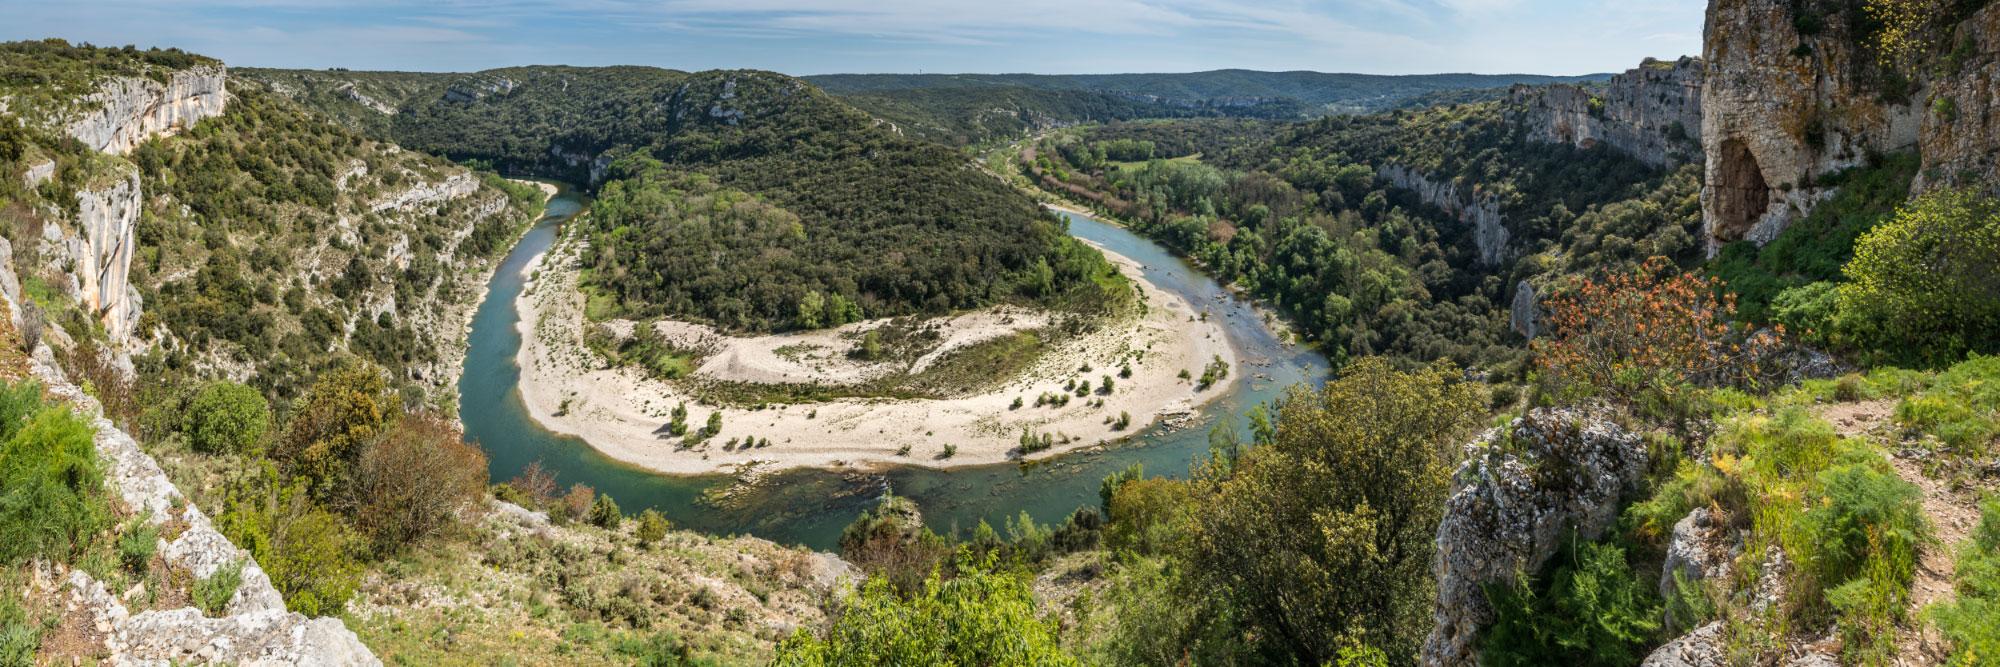 Méandre des gorges du Gardon, Sainte-Anastasie